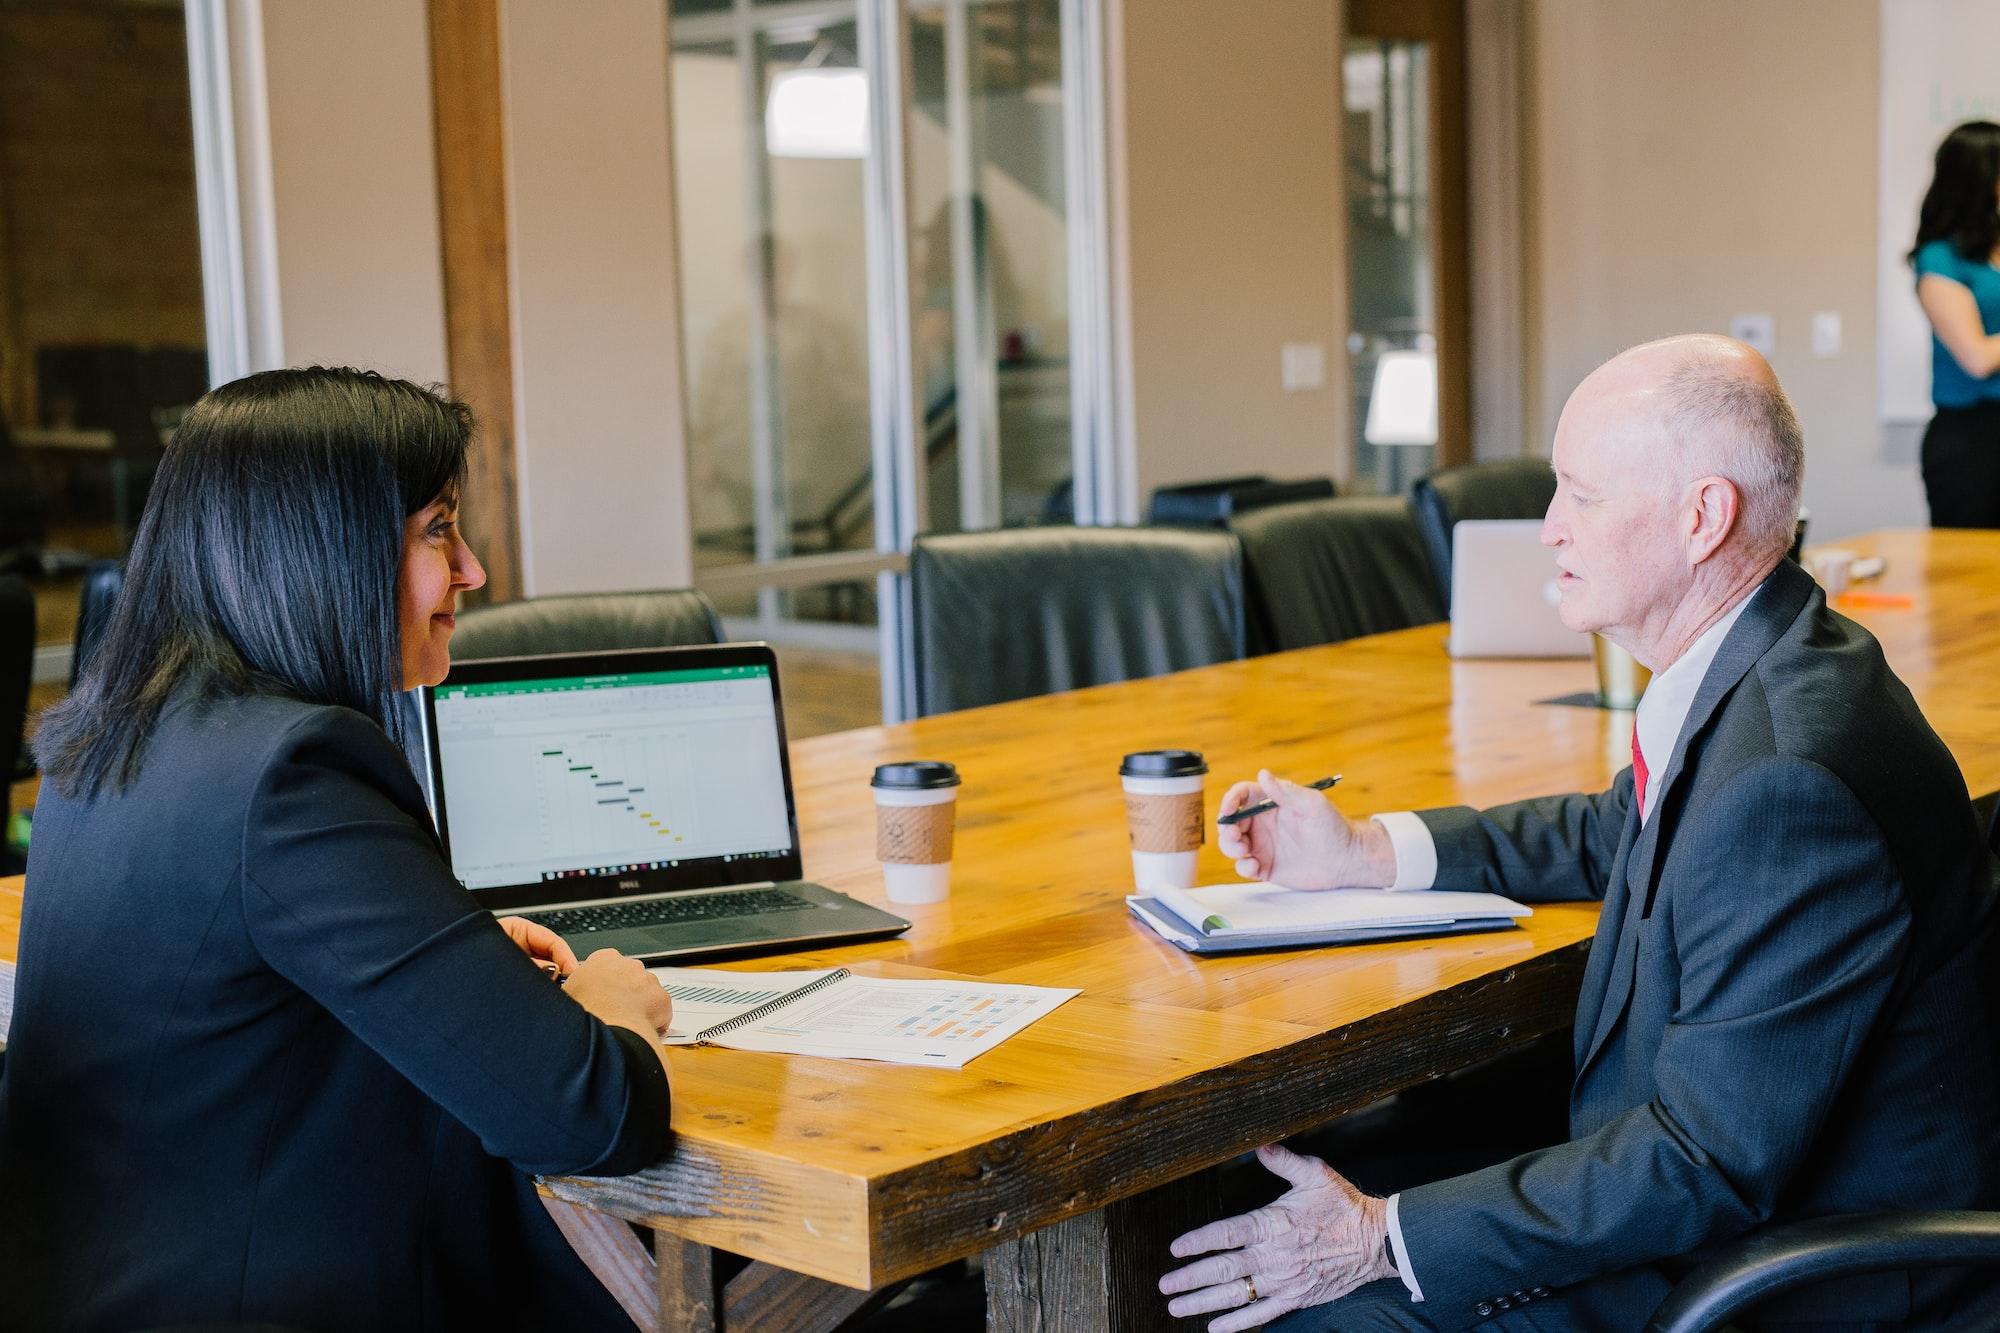 Woman boss educating older gentleman working together